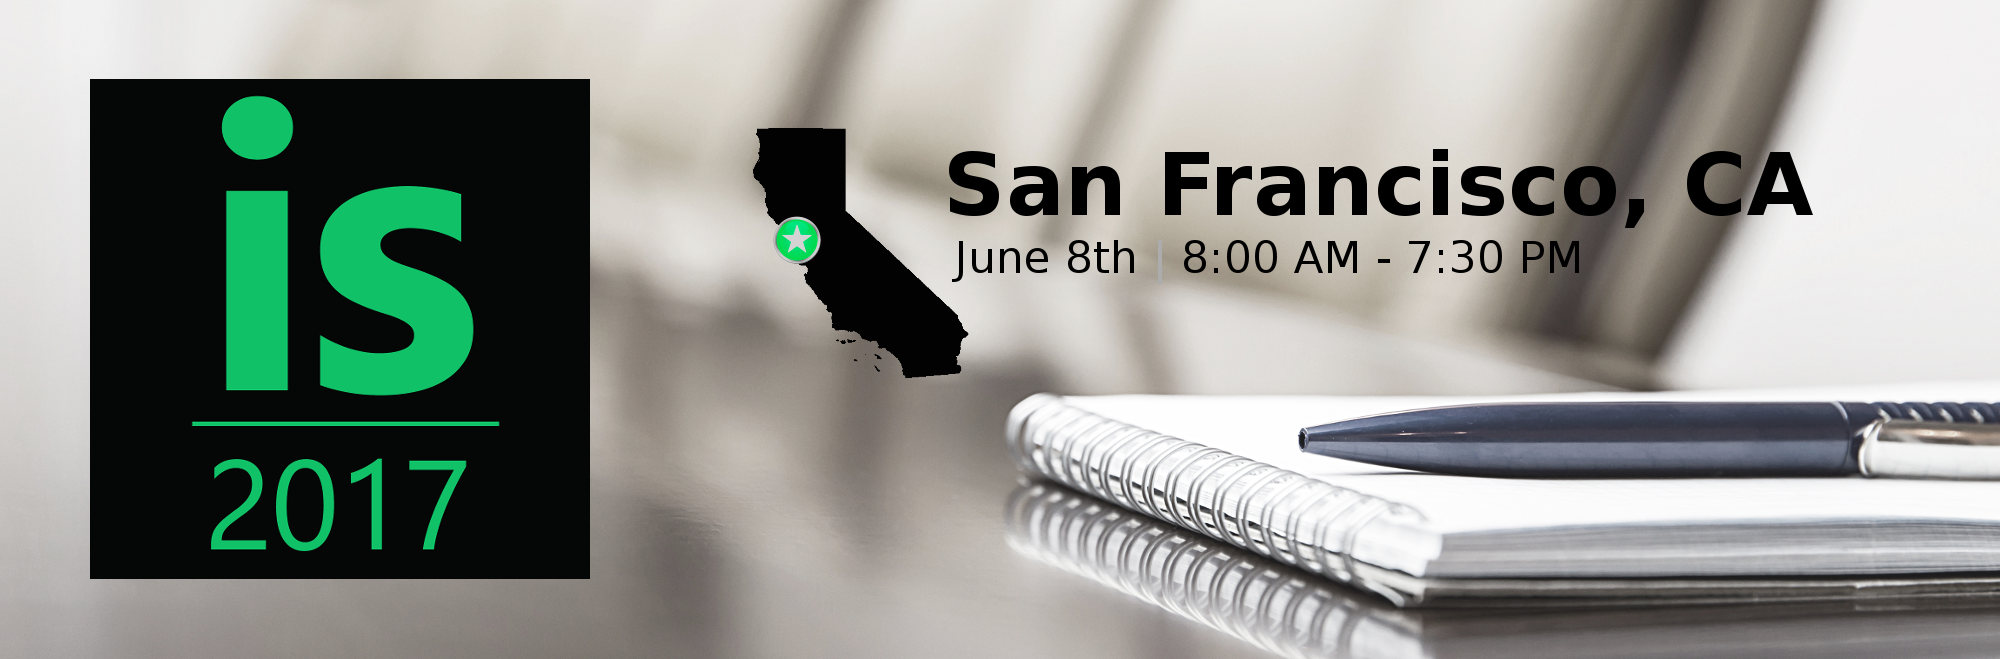 AAISP-San Francisco